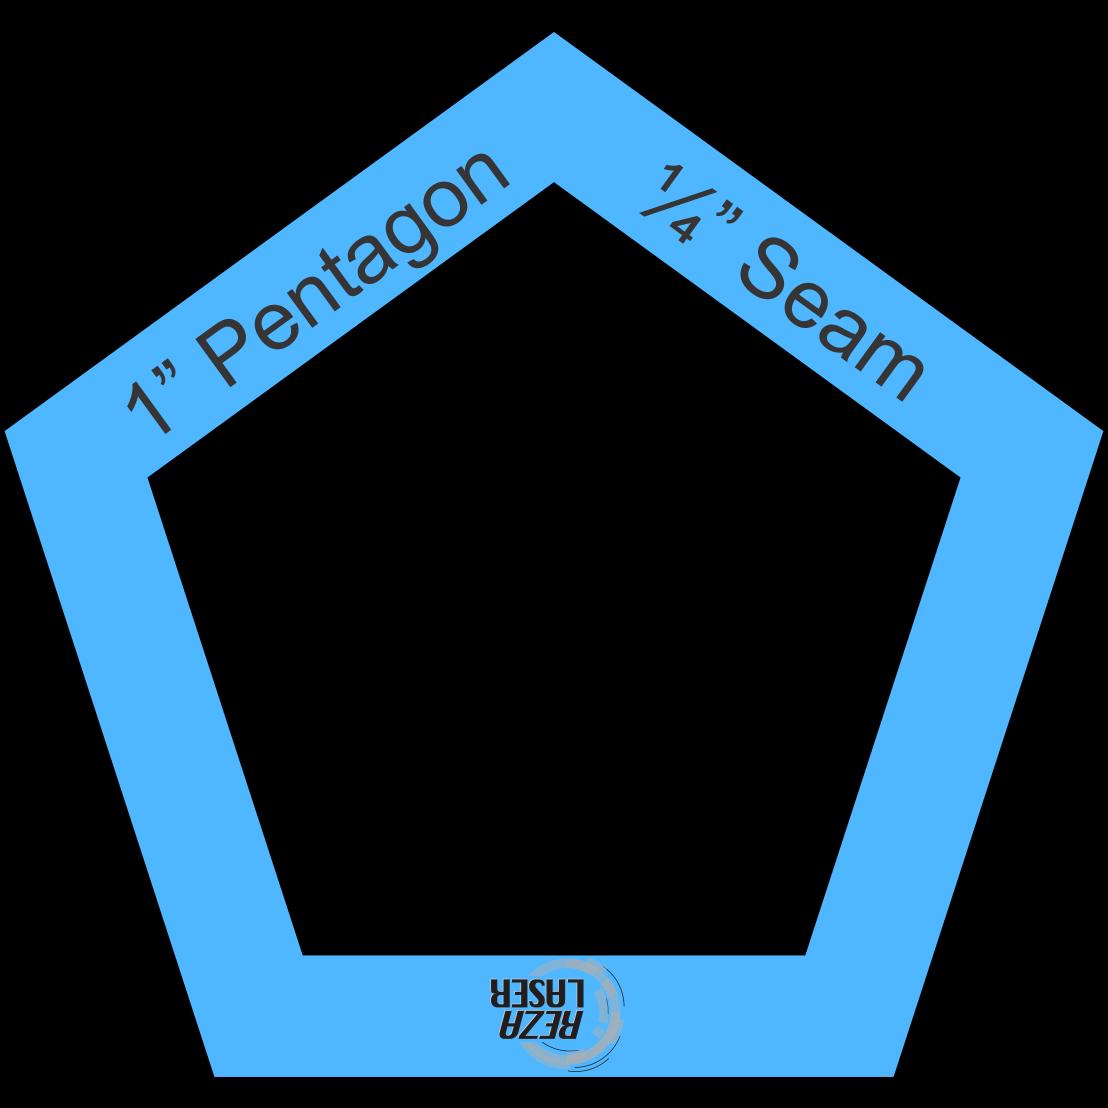 pentagon 1 inch acrylic template i spy with seam allowance